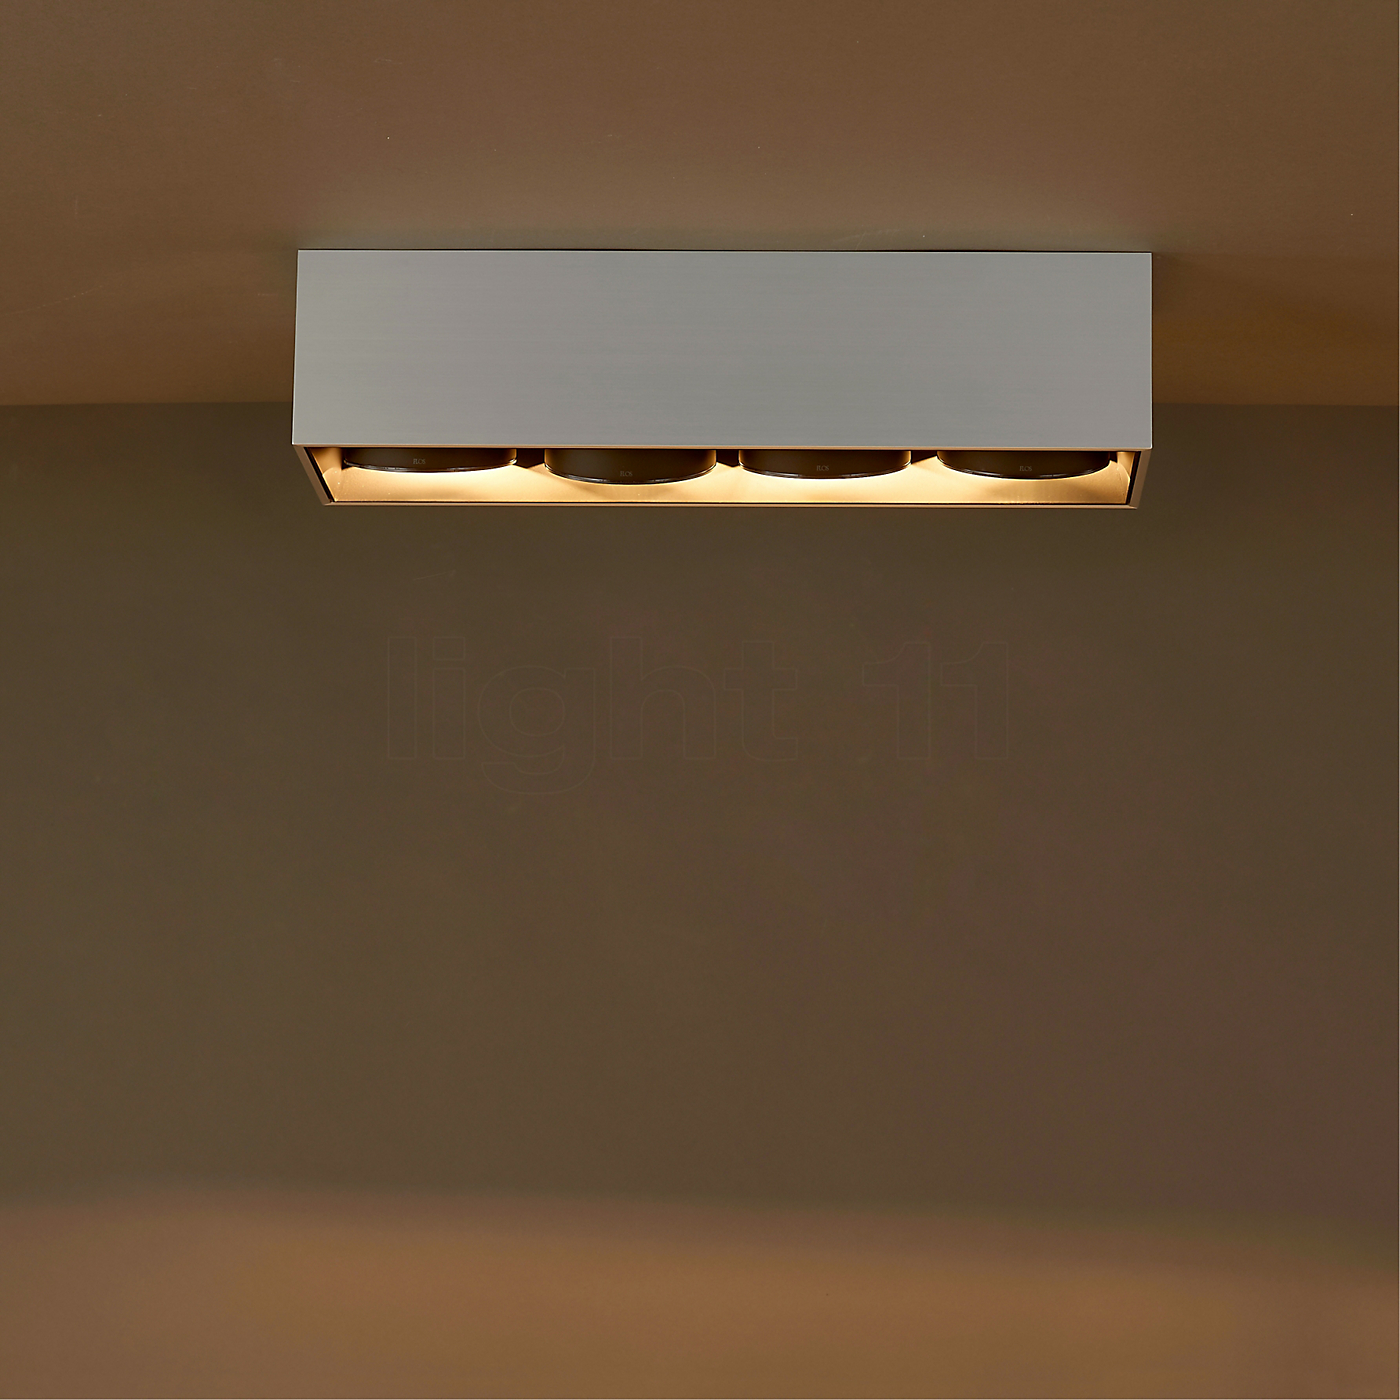 flos compass box 4 h135 qr111 ceiling lights lamps. Black Bedroom Furniture Sets. Home Design Ideas